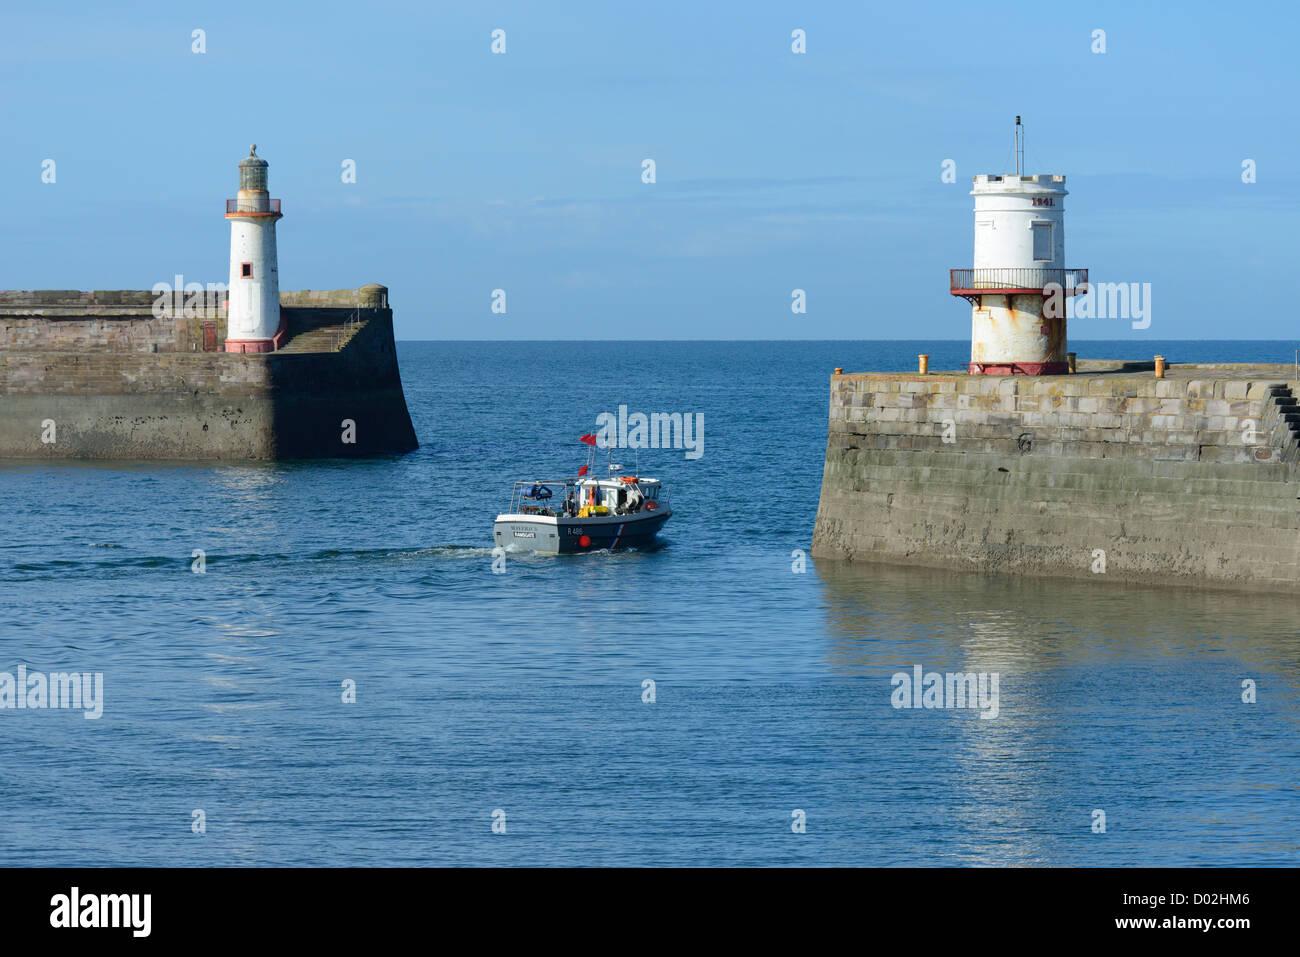 fishing-boat-maverick-leaving-the-harbour-whitehaven-cumbria-england-D02HM6.jpg